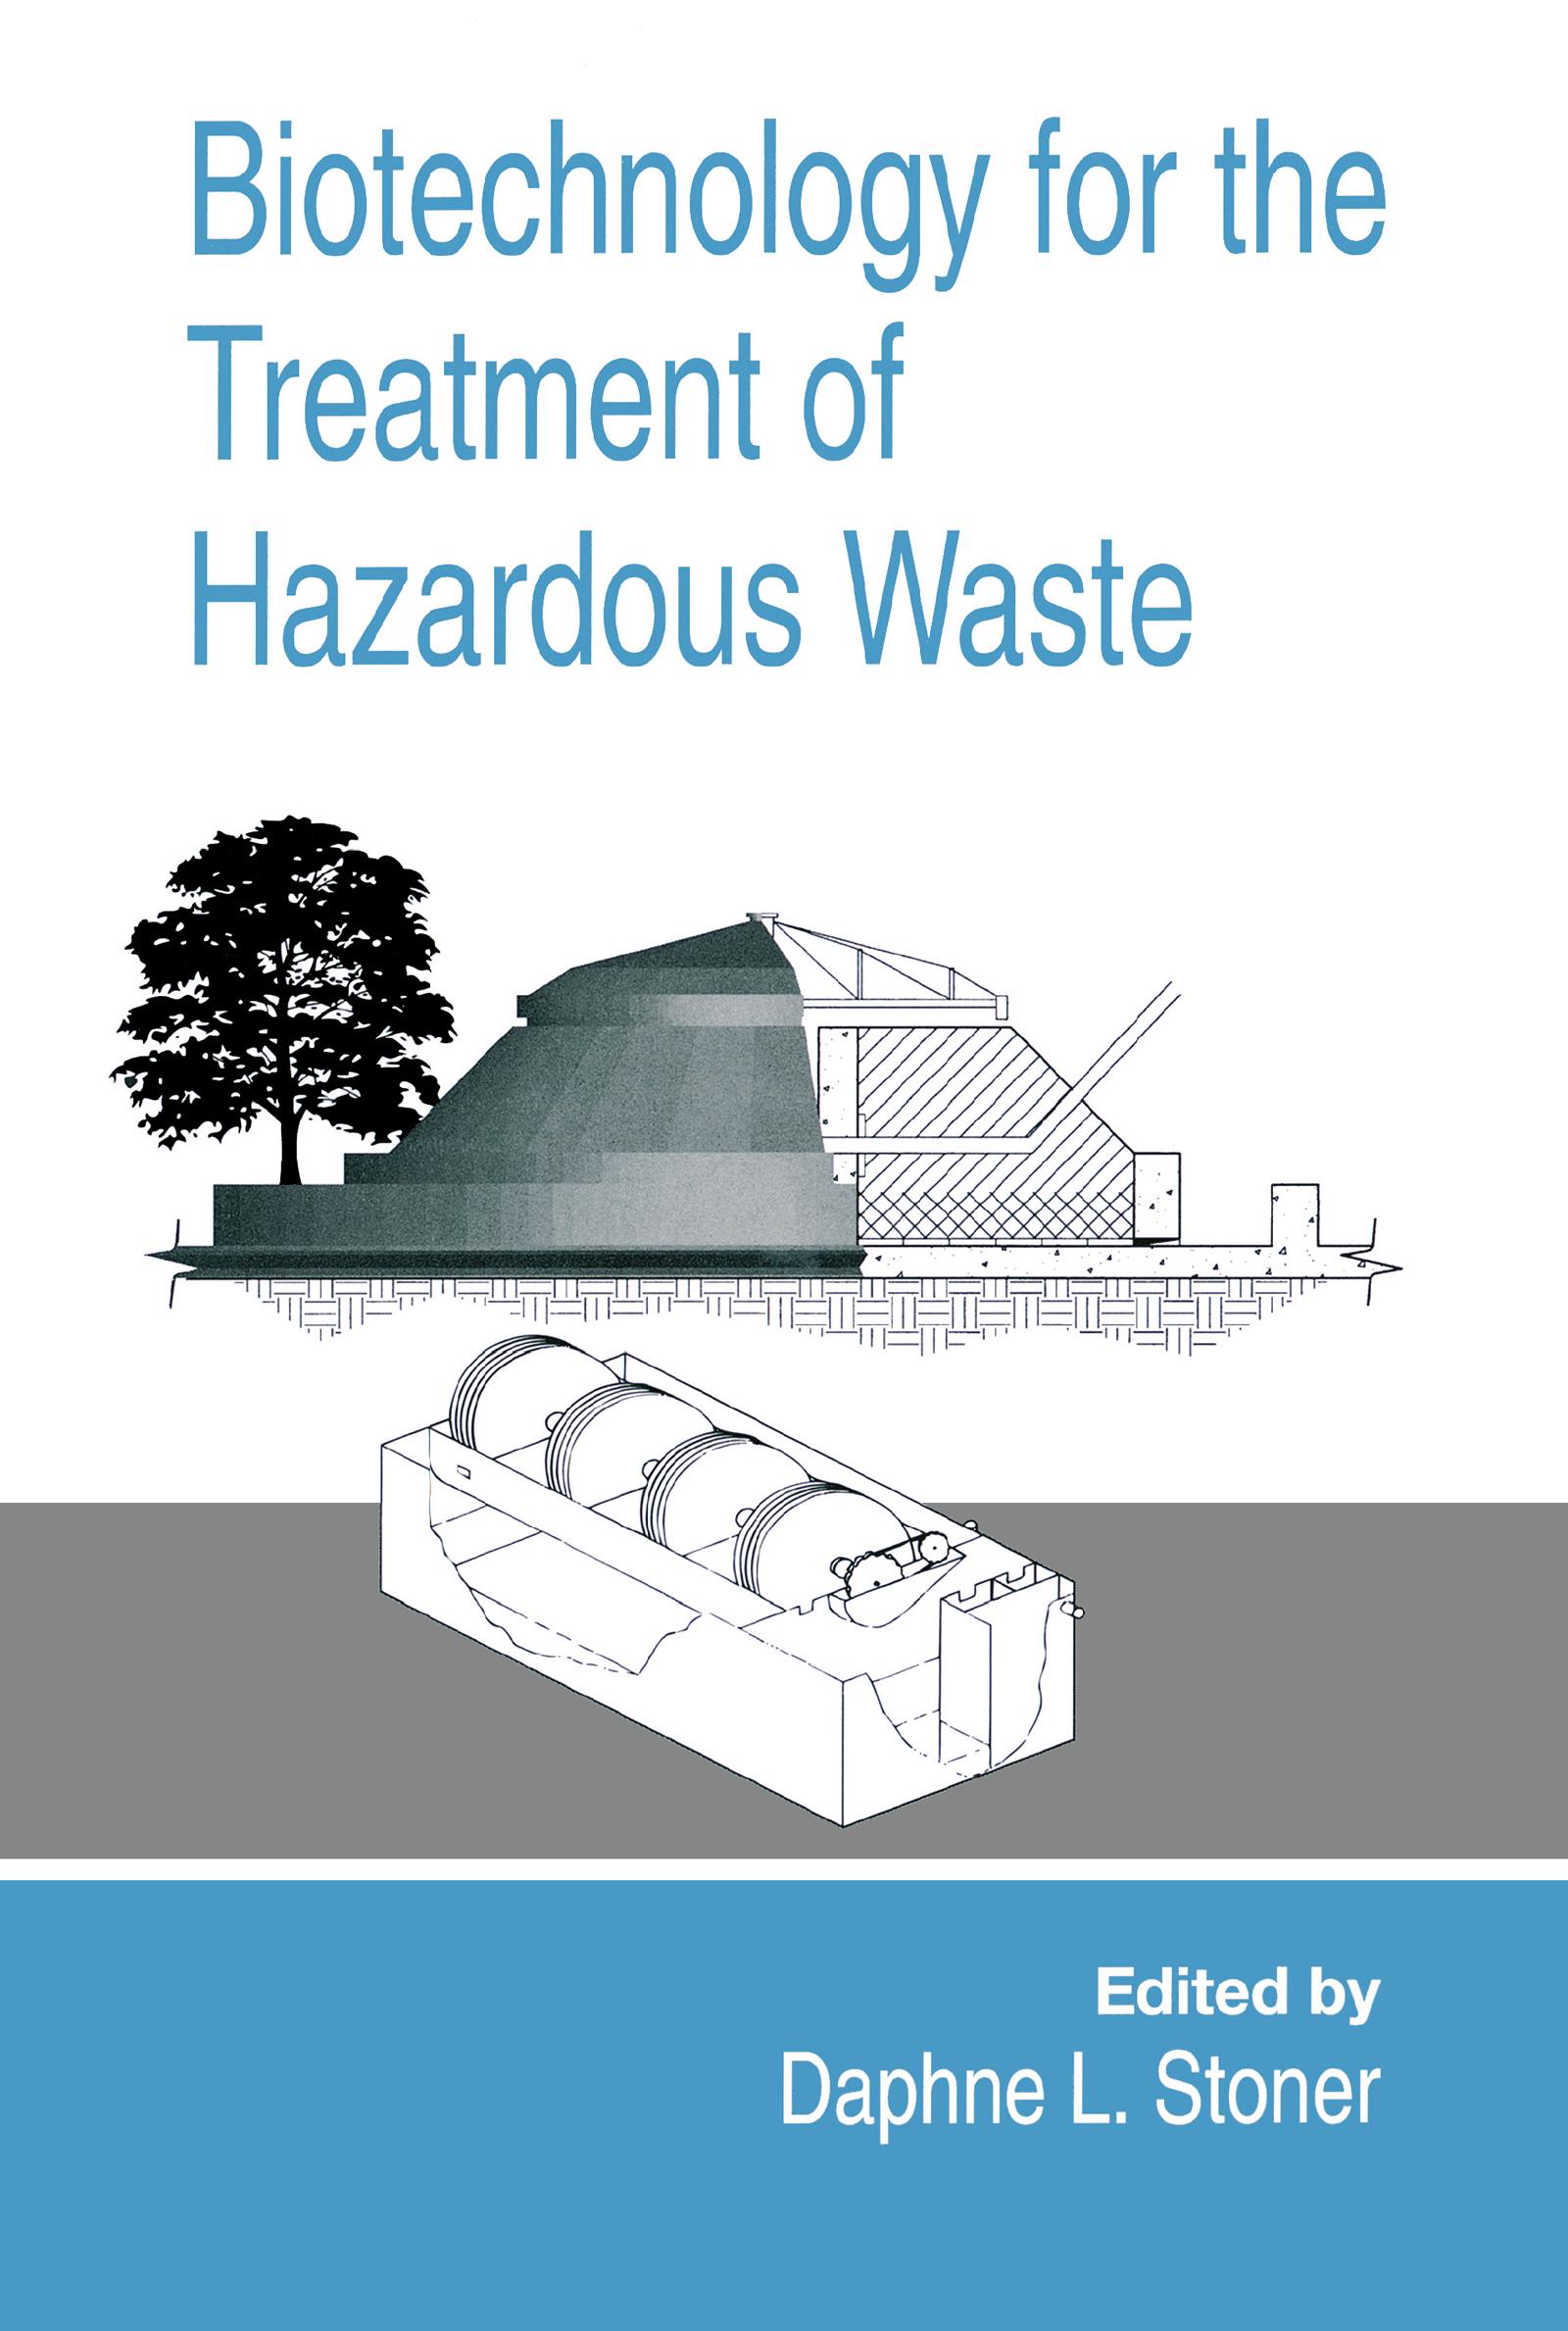 Biotechnology for the Treatment of Hazardous Waste